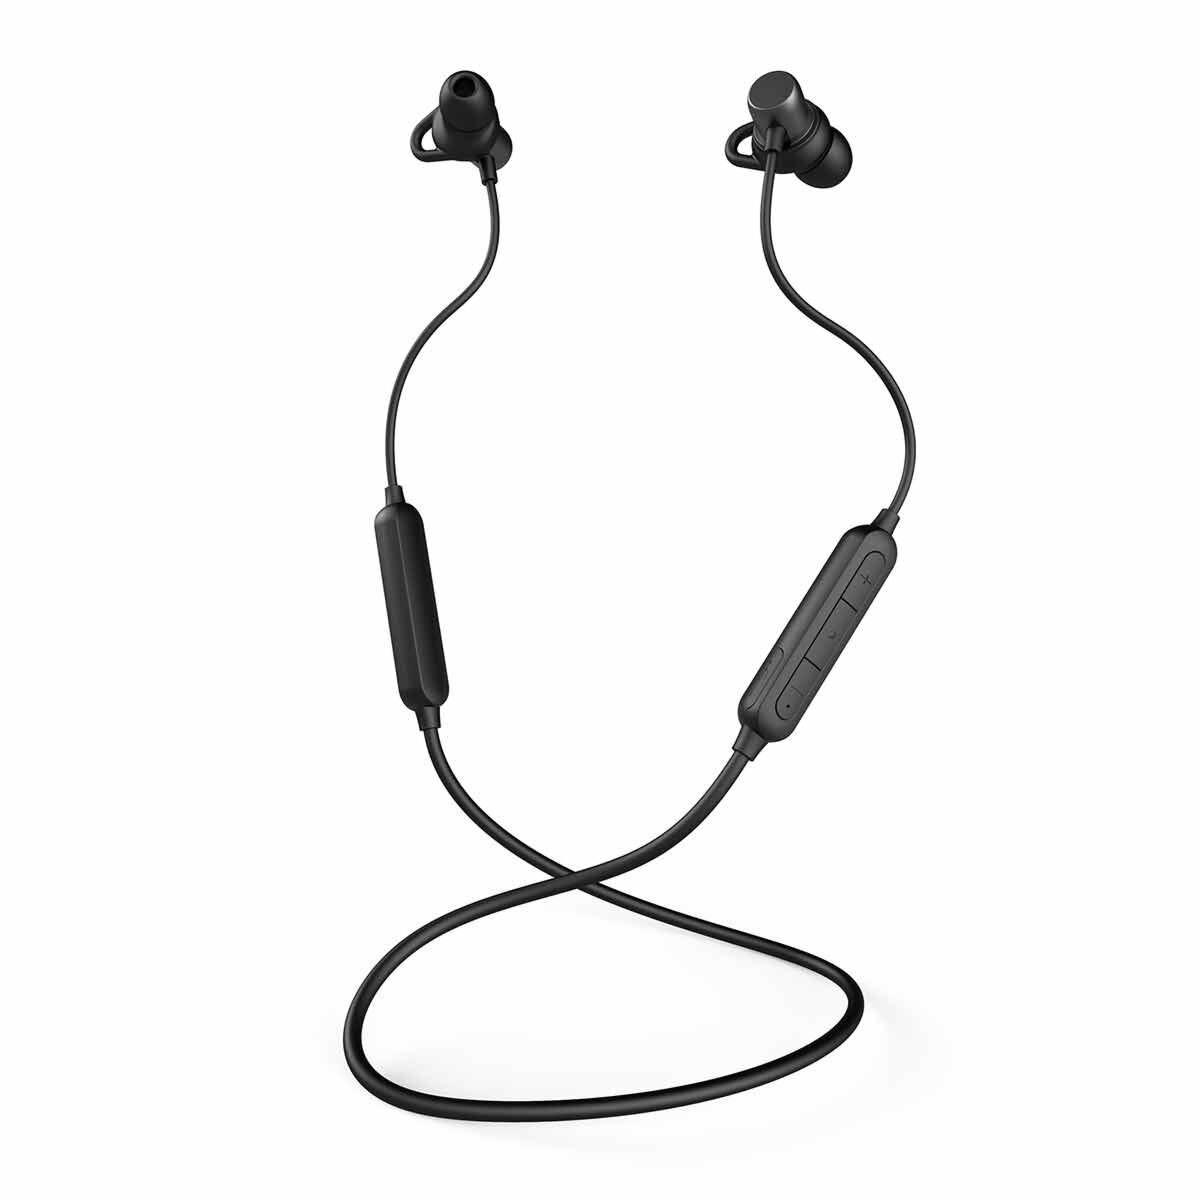 MIXX Play SX Wireless Earphones